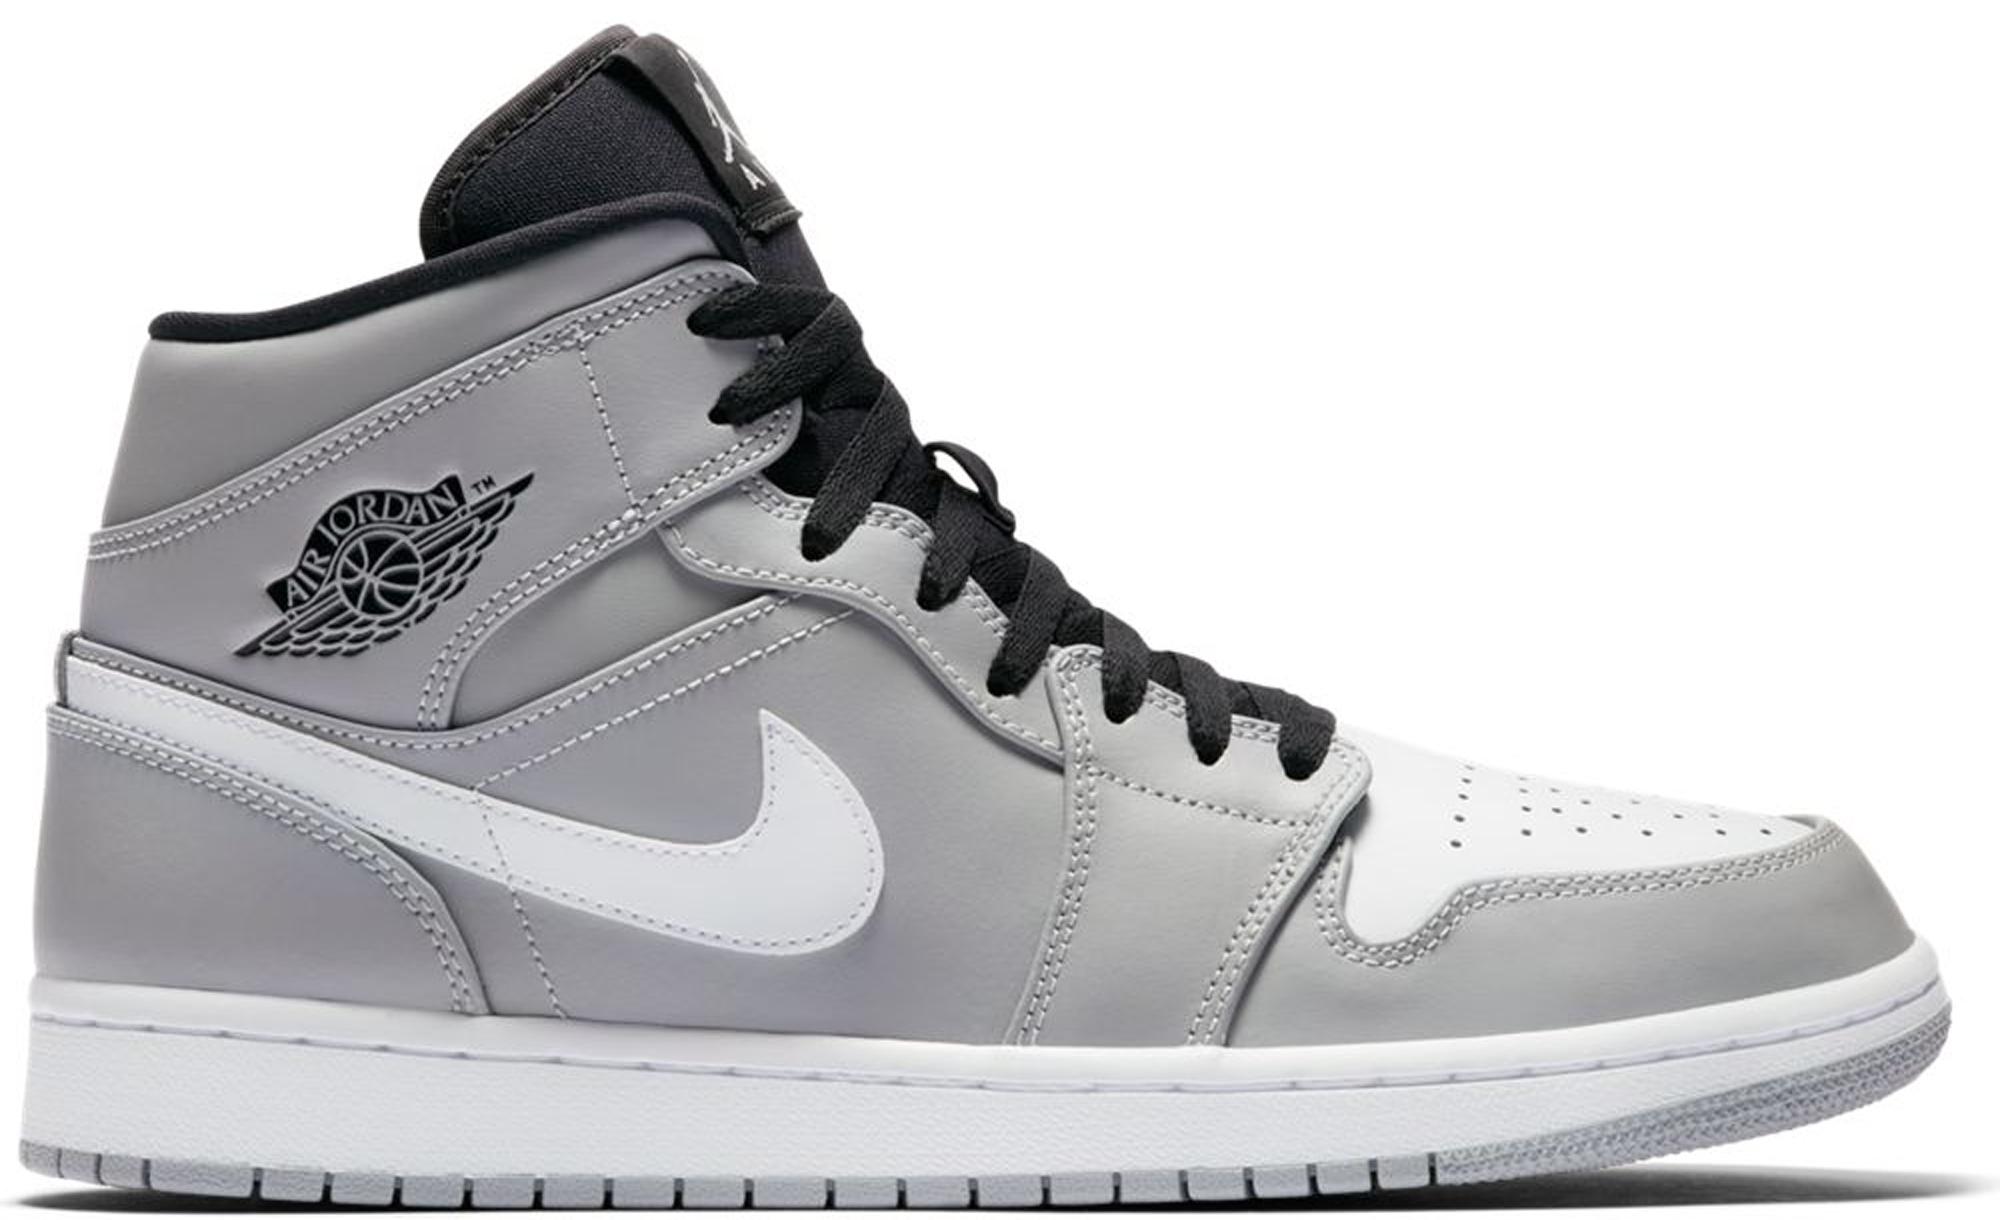 grey and white jordan 1